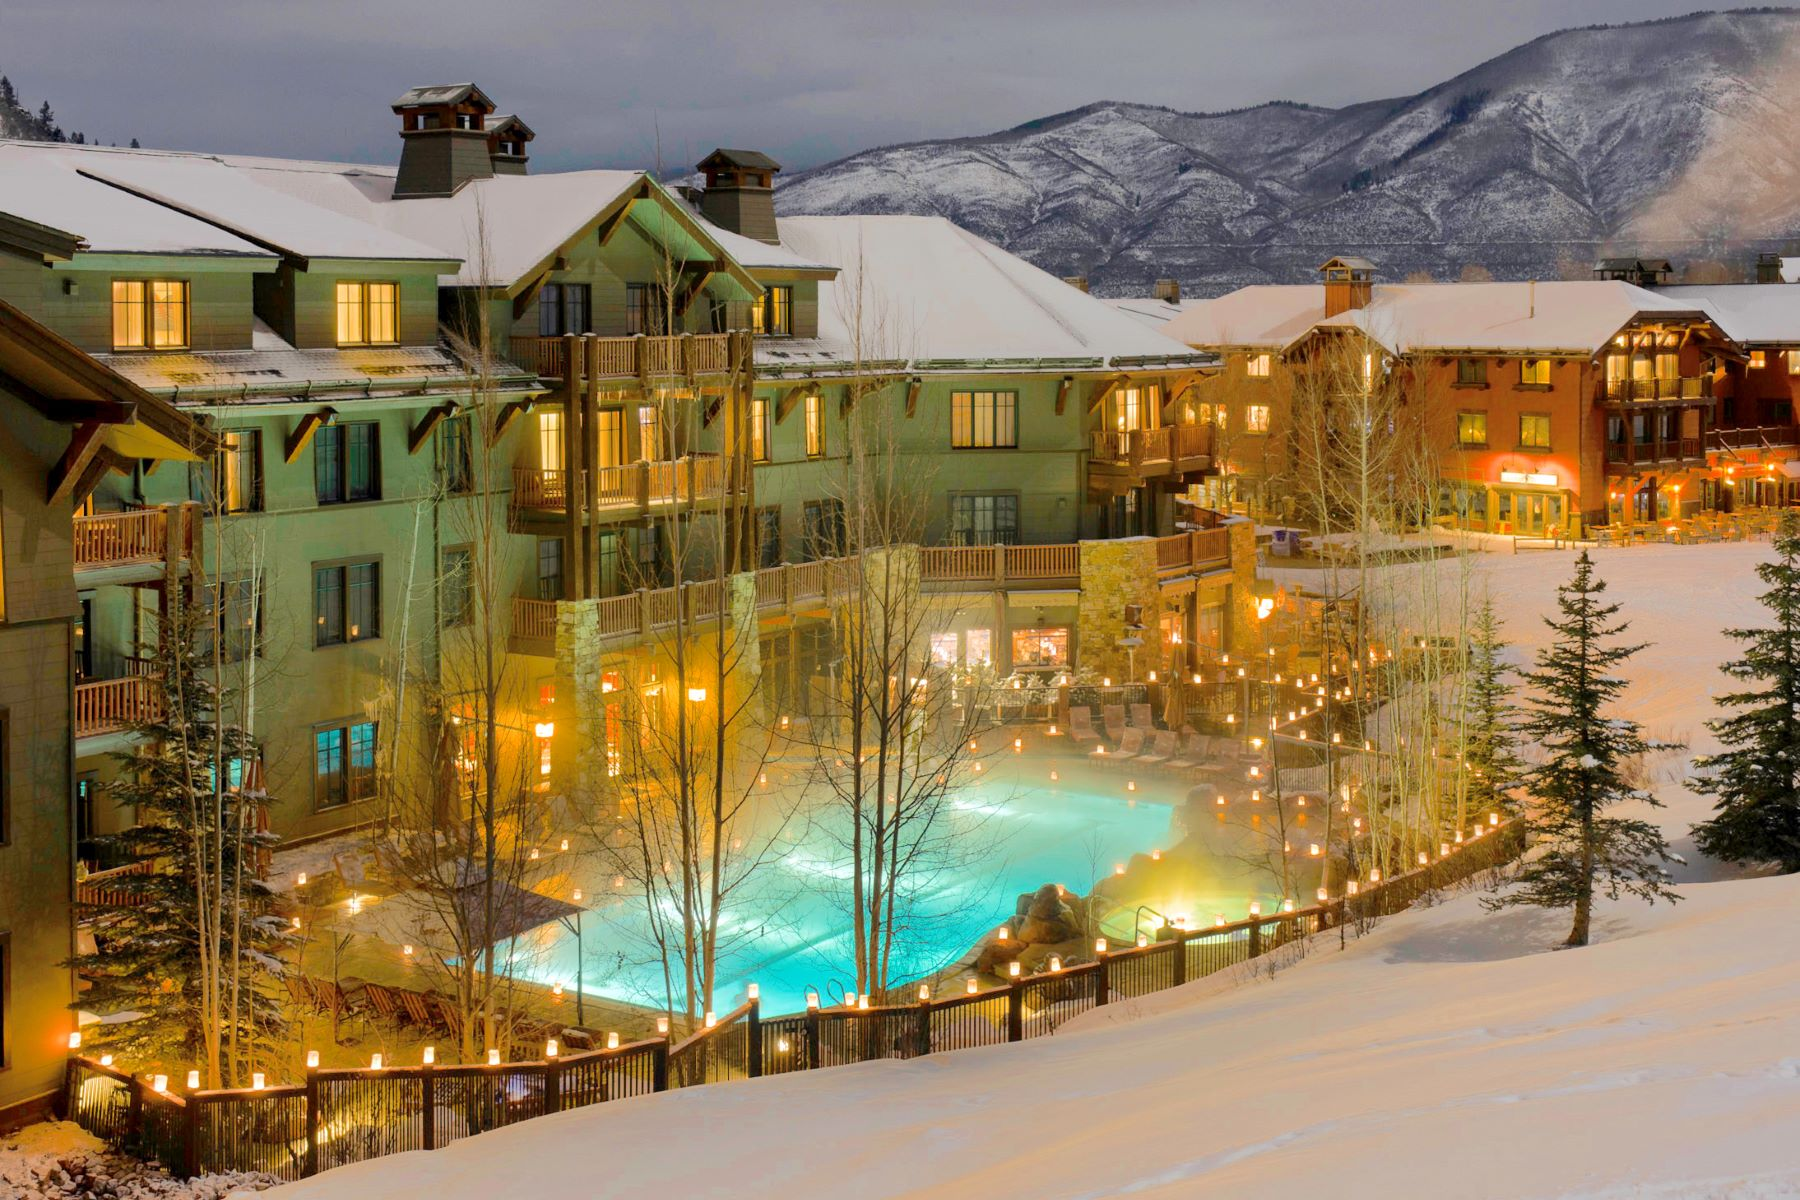 部分所有權 為 出售 在 Ritz-Carlton Club Condo Fractional Interest, 8309, Interest 1 0075 Prospector Road, 8309, Interest 1, Aspen, 科羅拉多州, 81611 美國